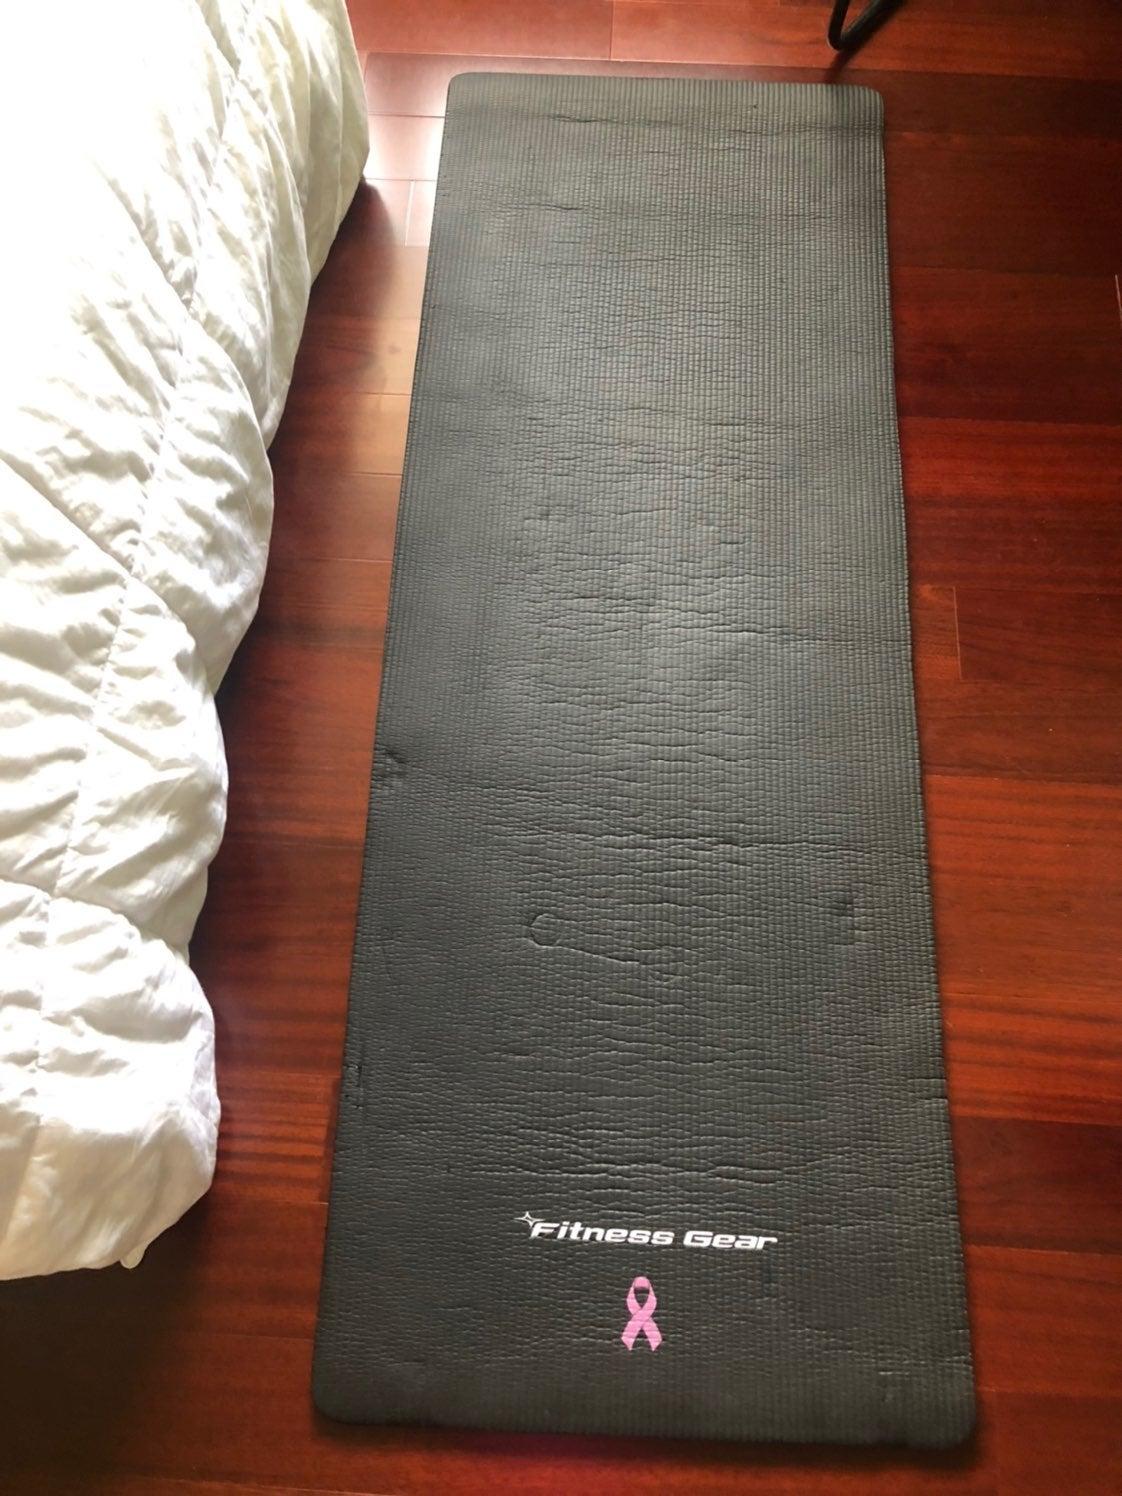 Fitness Gear yoga mat